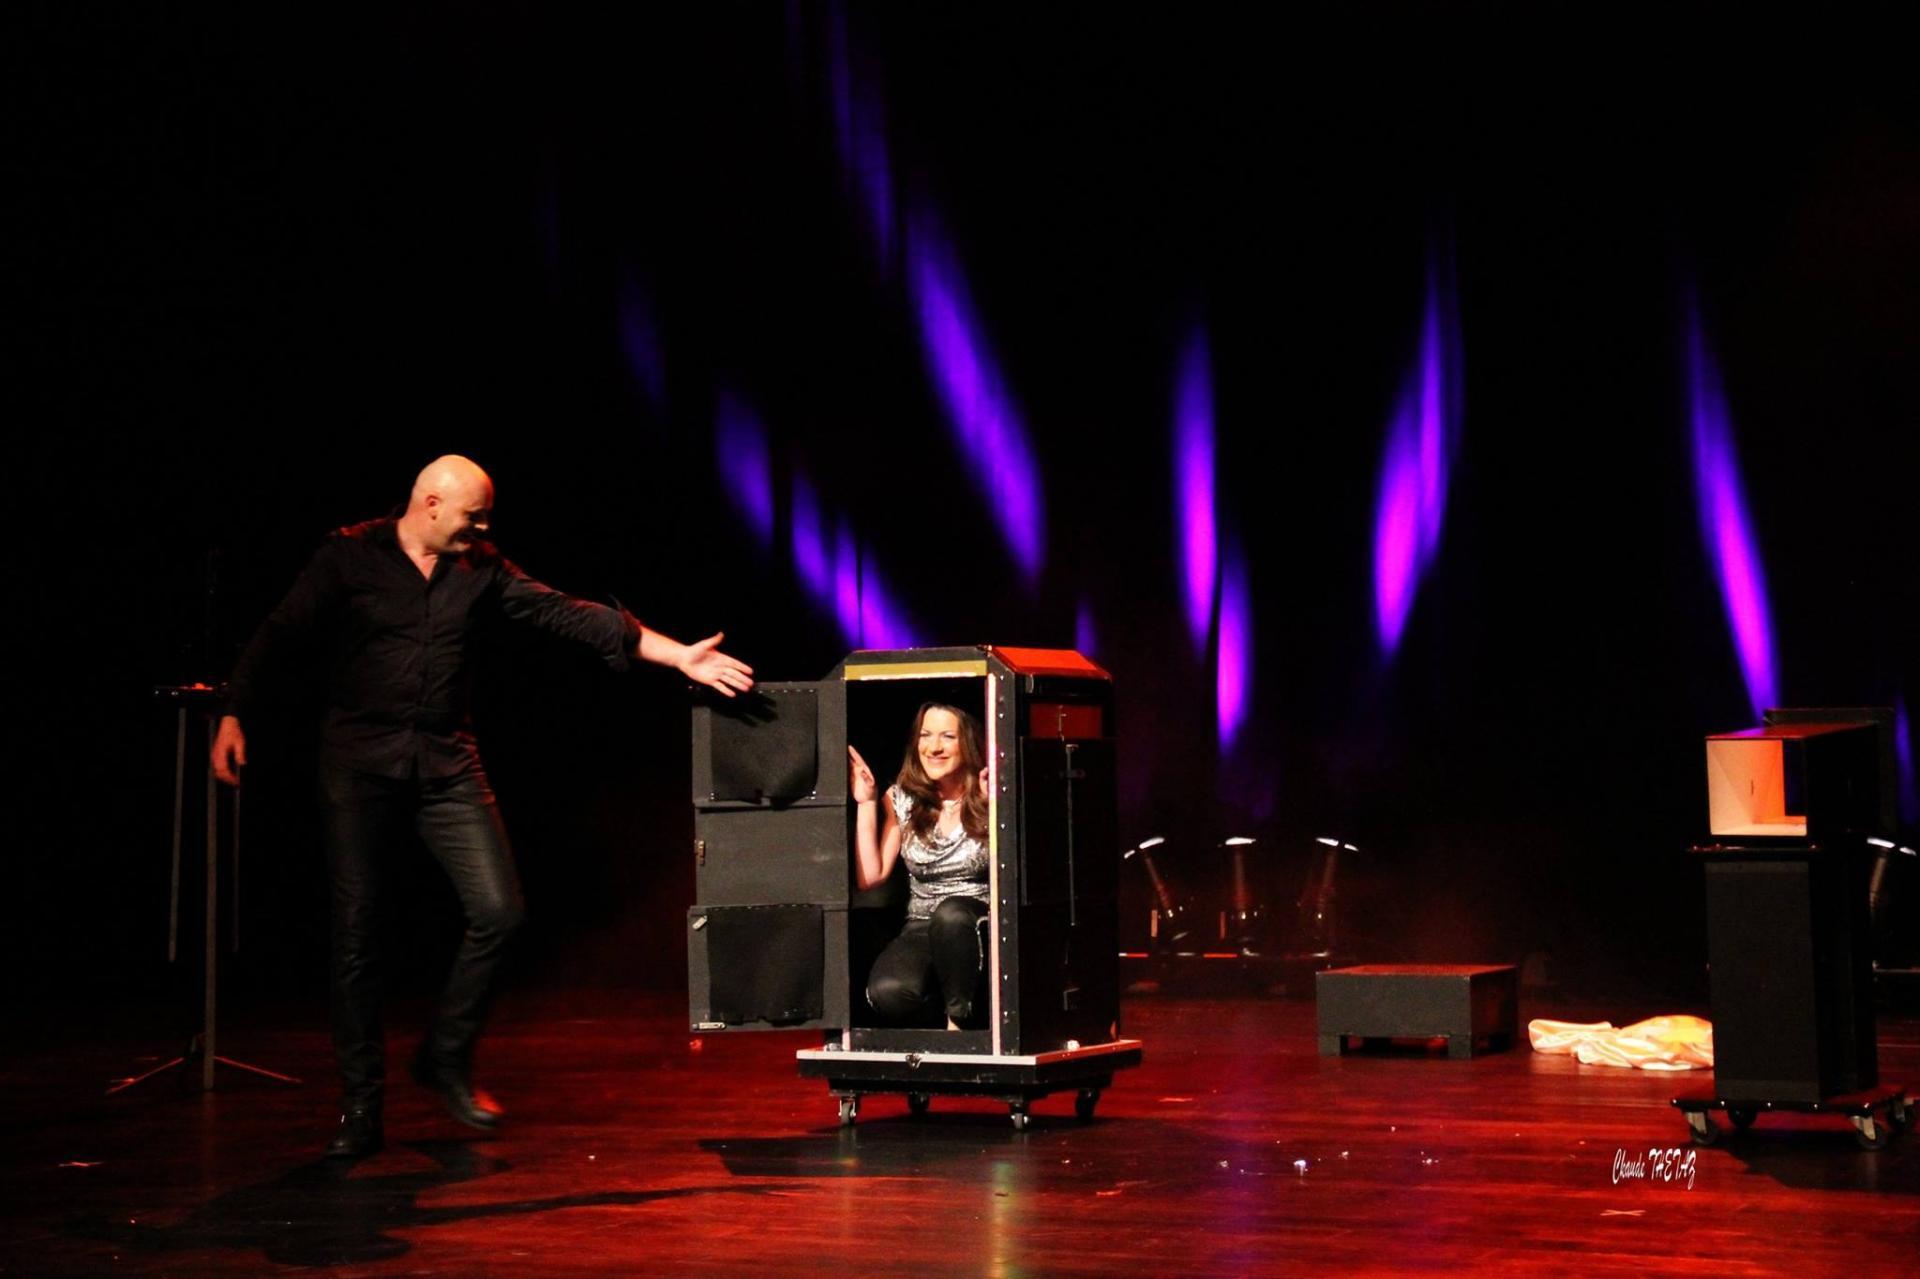 Axel lupin magicien magie pyrenees atlantique scene grande illusion spectacle enfants cabaret aquitaine